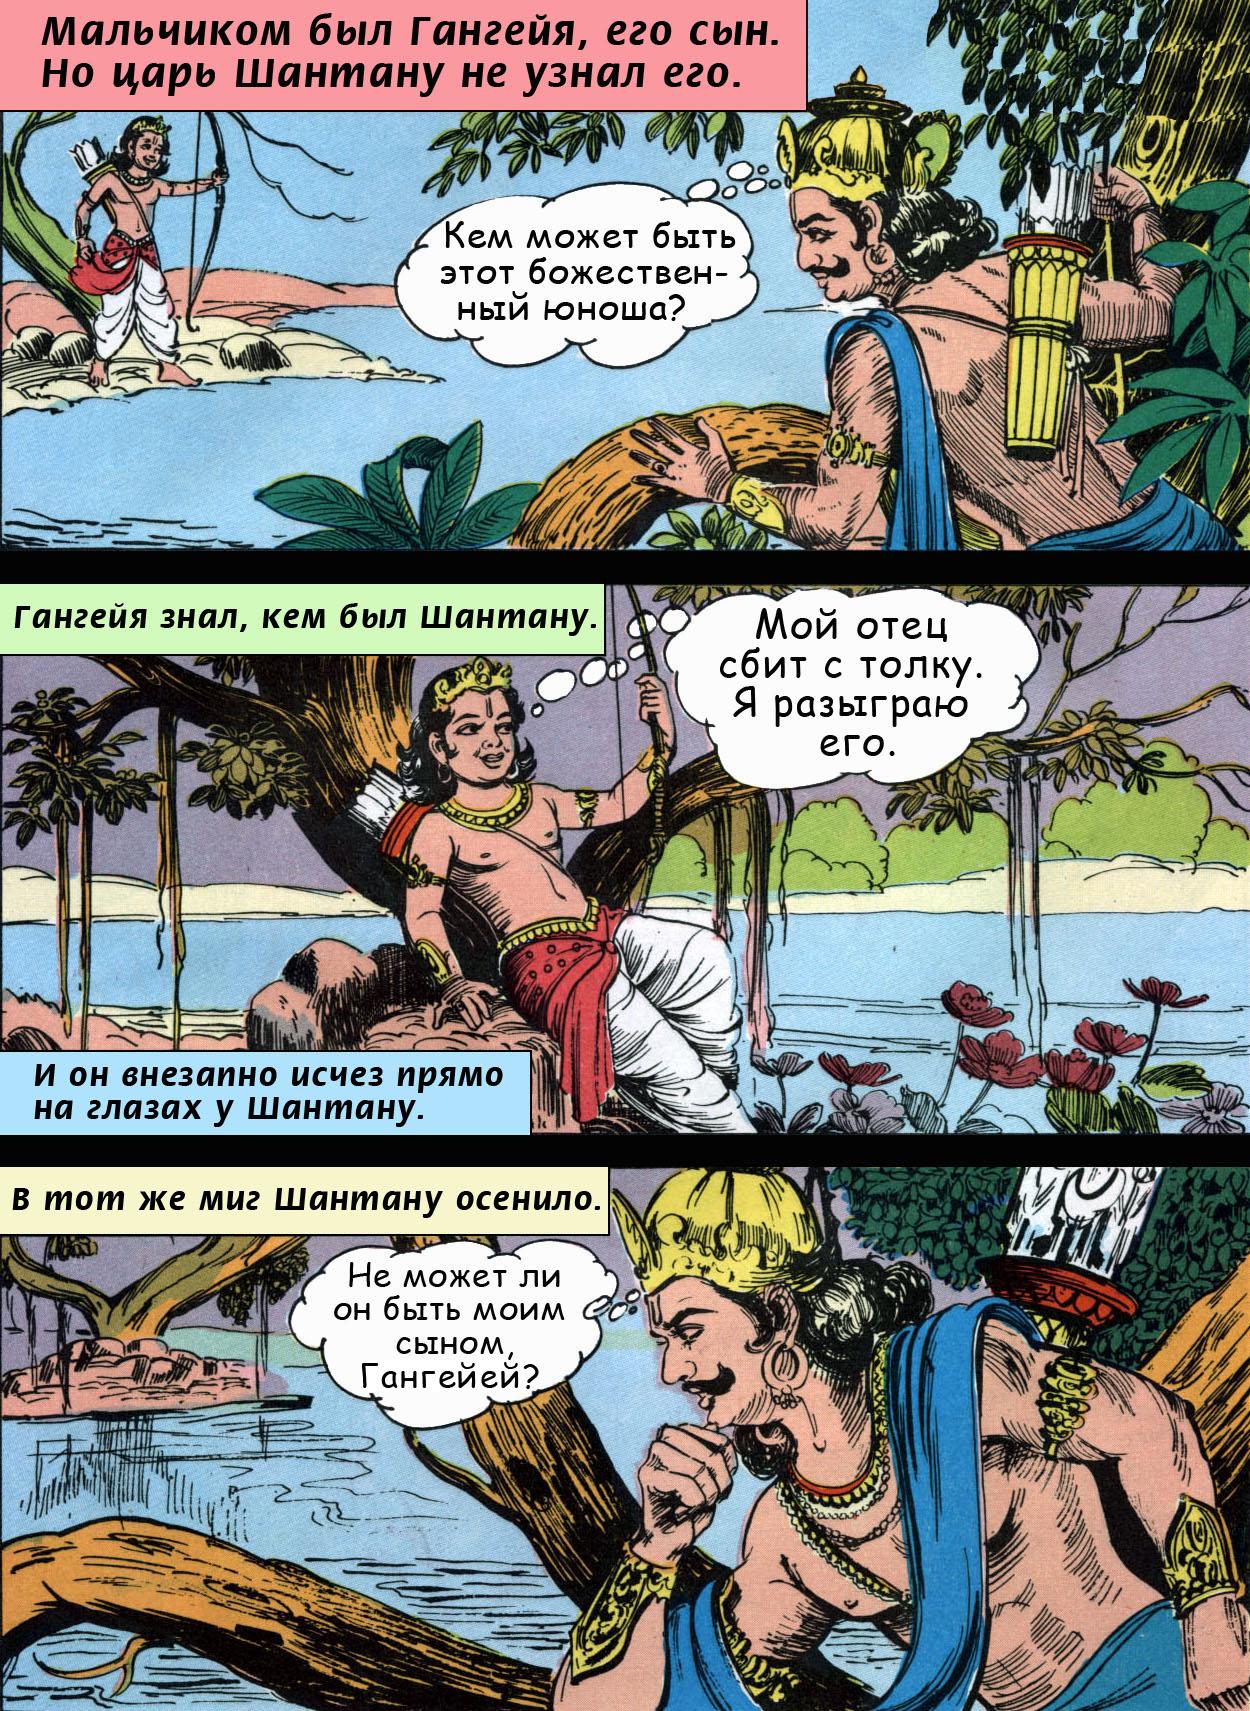 Бхишма 07 - ведический комикс